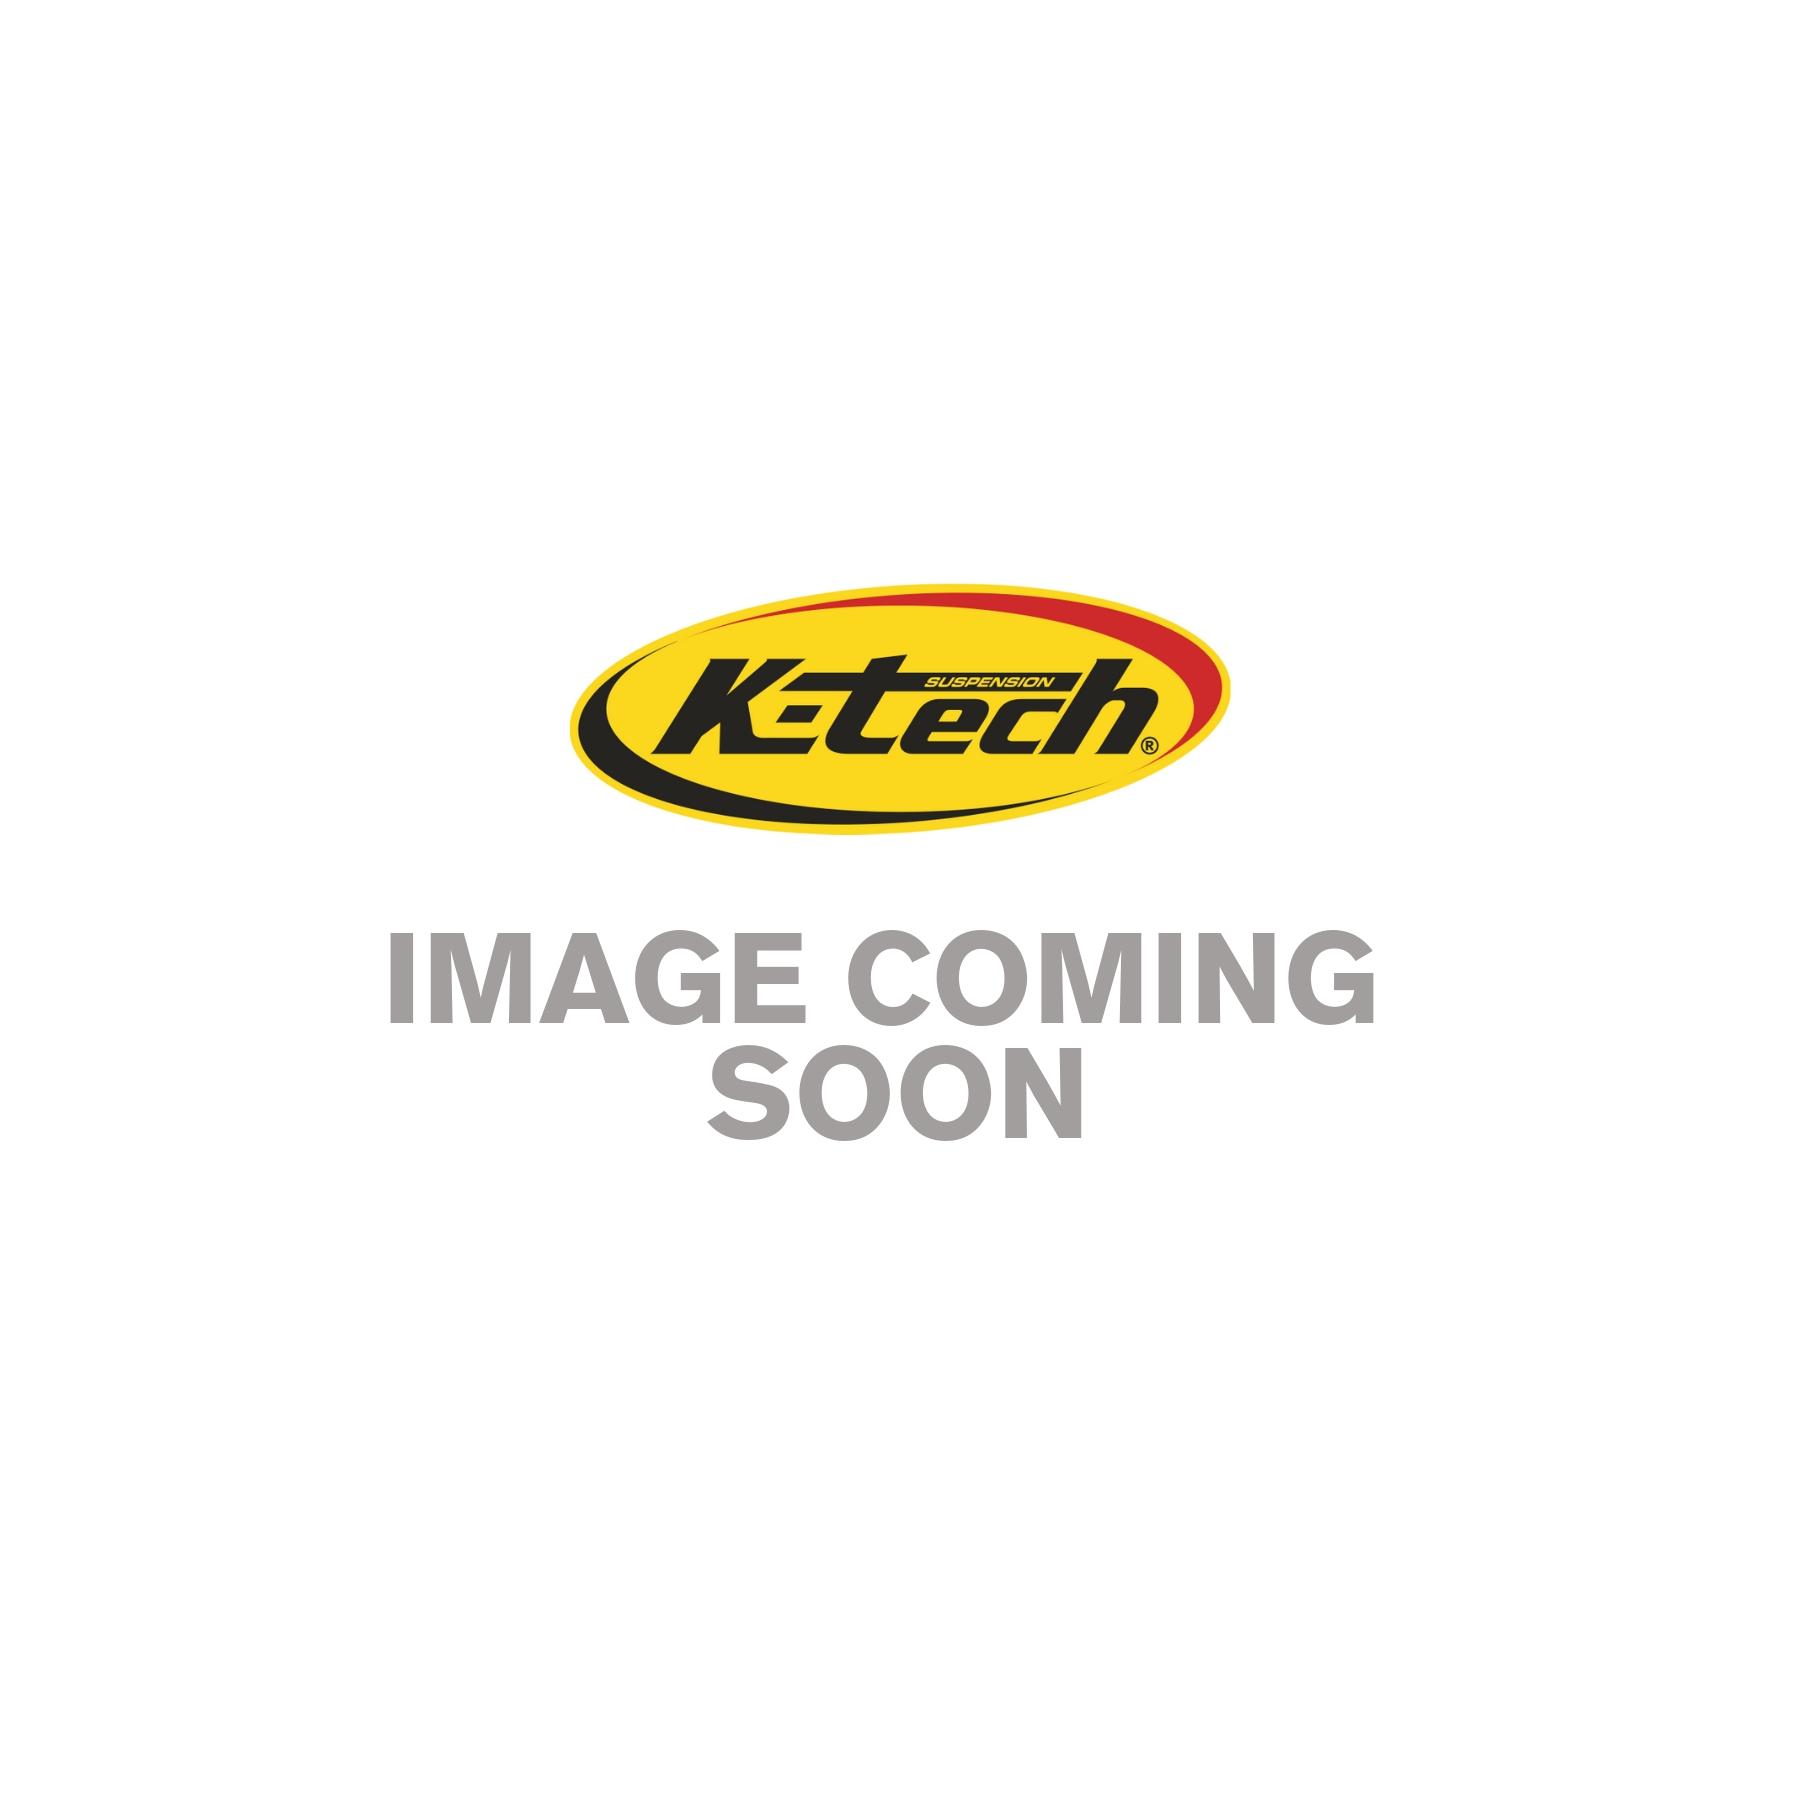 Tool - Shock Absorber Spring Jack Insert -(74.50x86.50) KYB/Showa